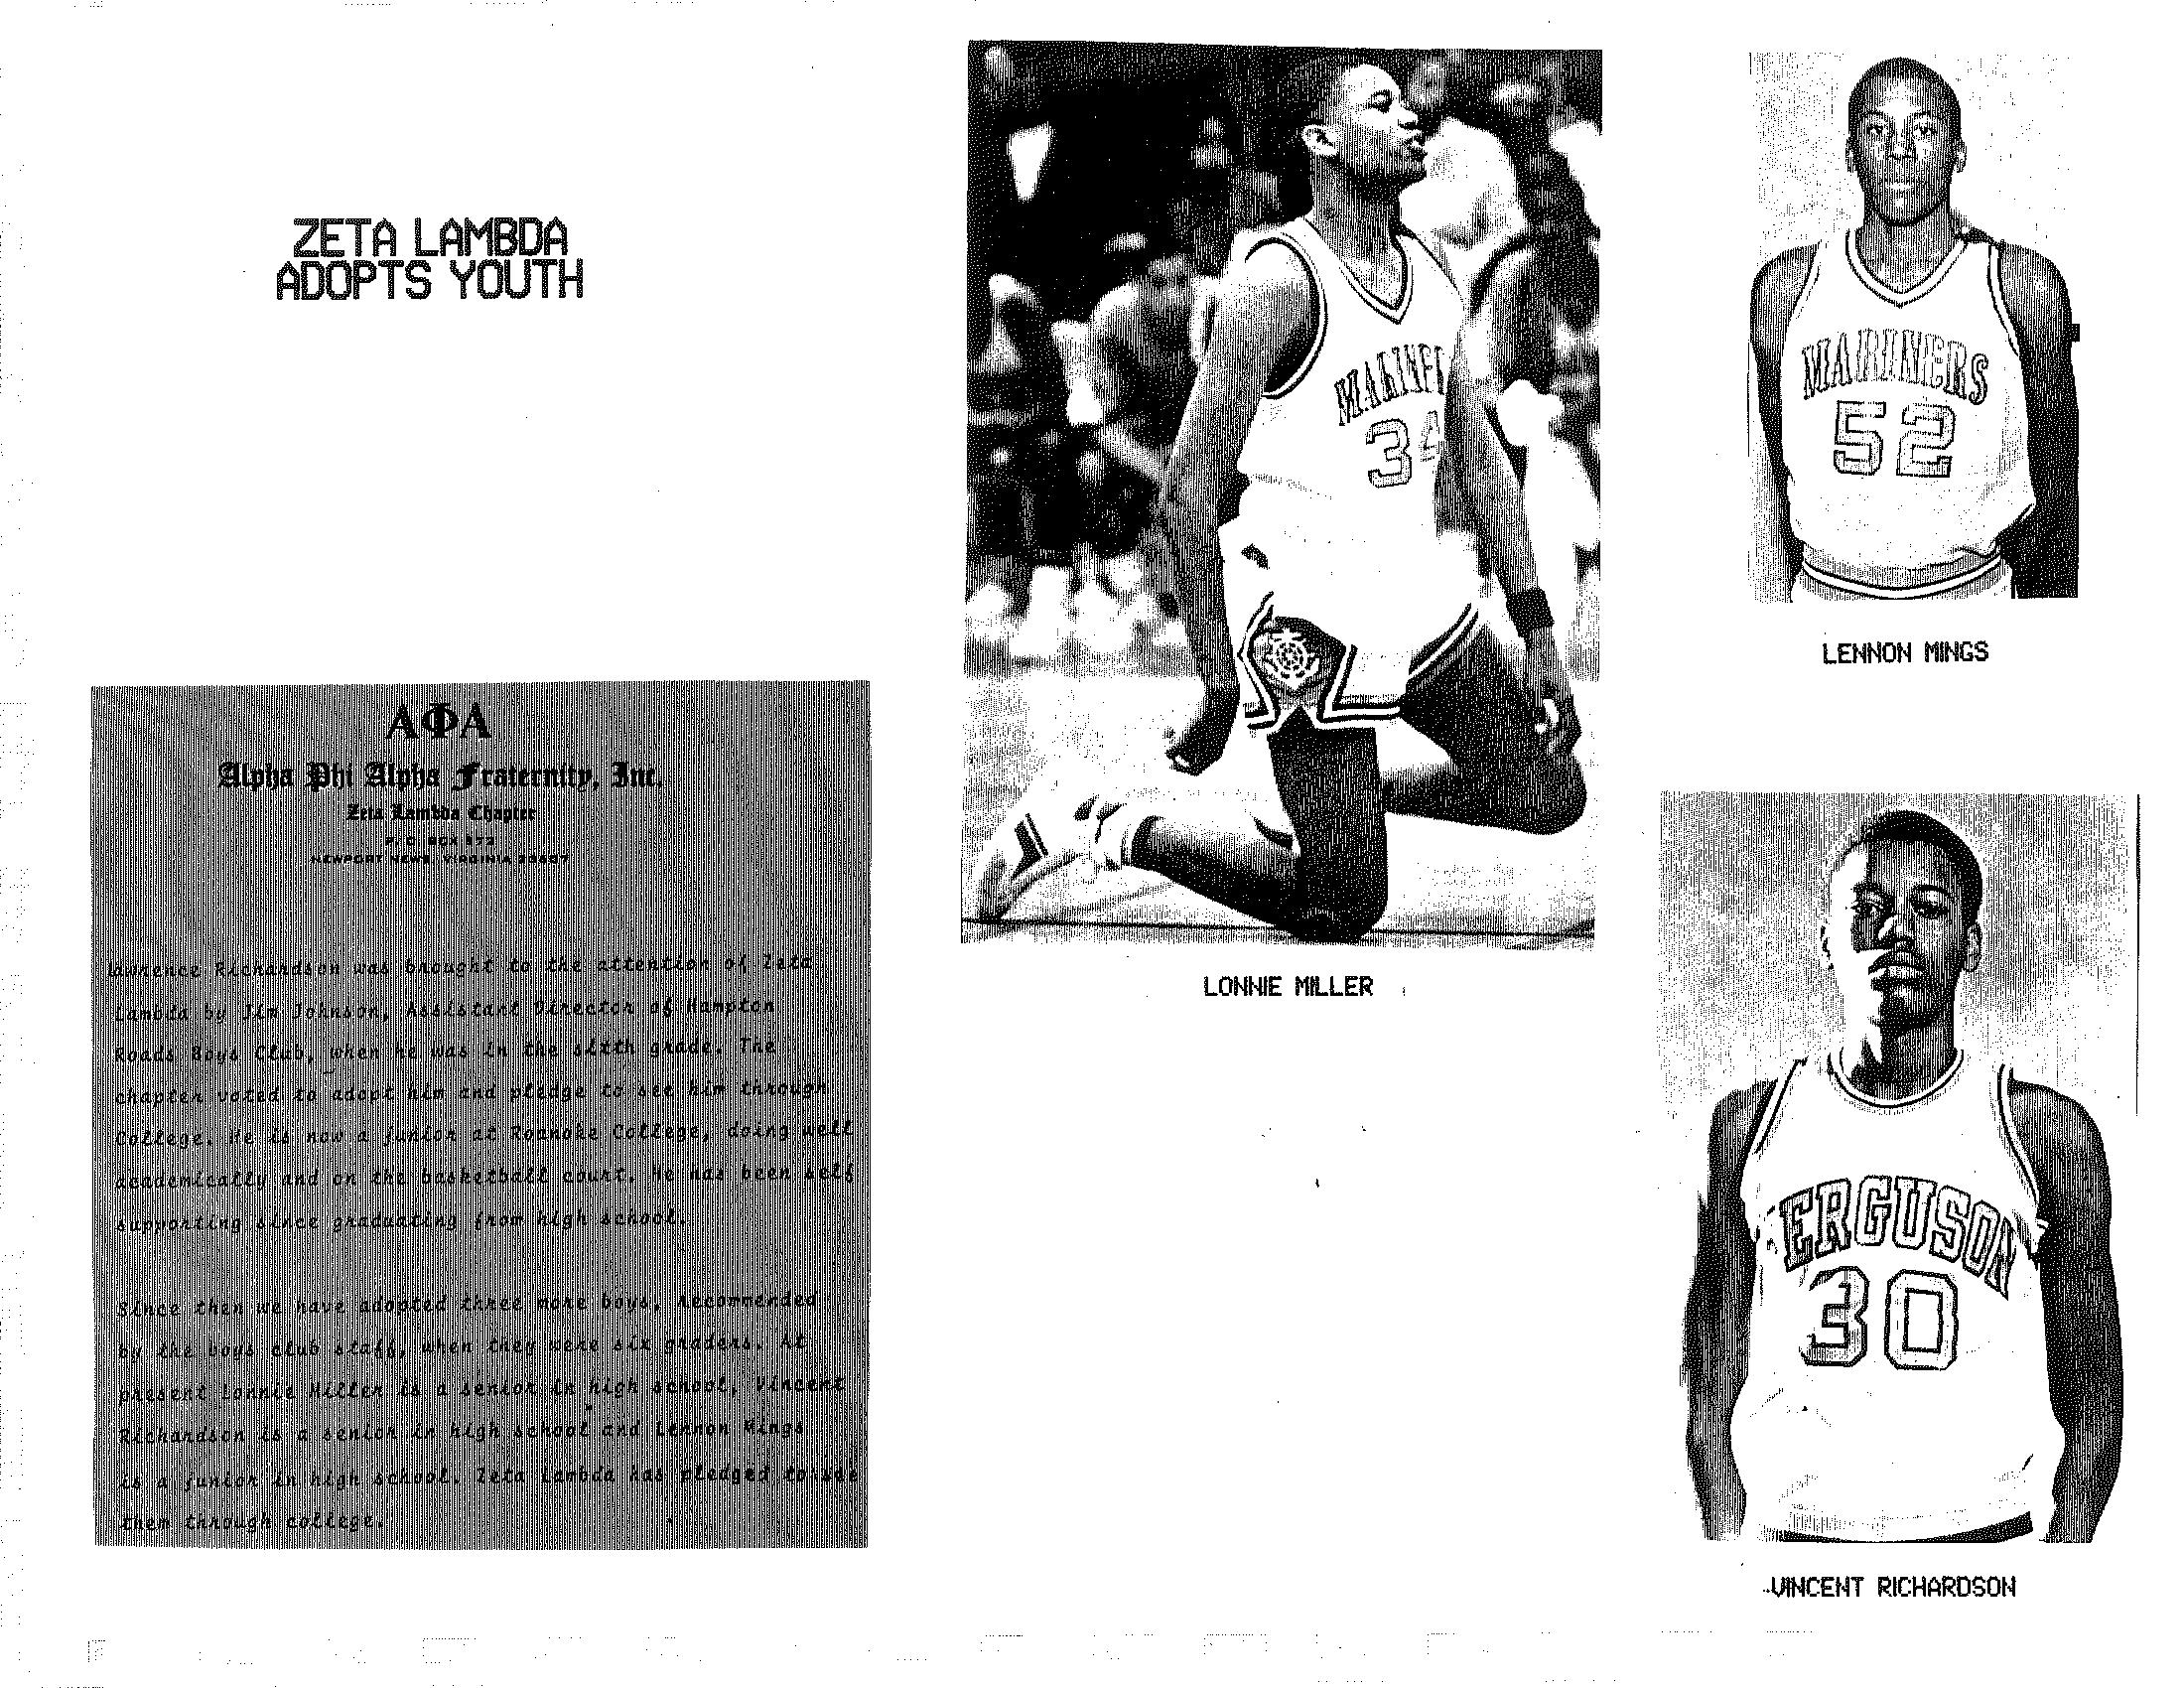 Zeta Lambda 1970s - Zeta Lambda Mentees.png